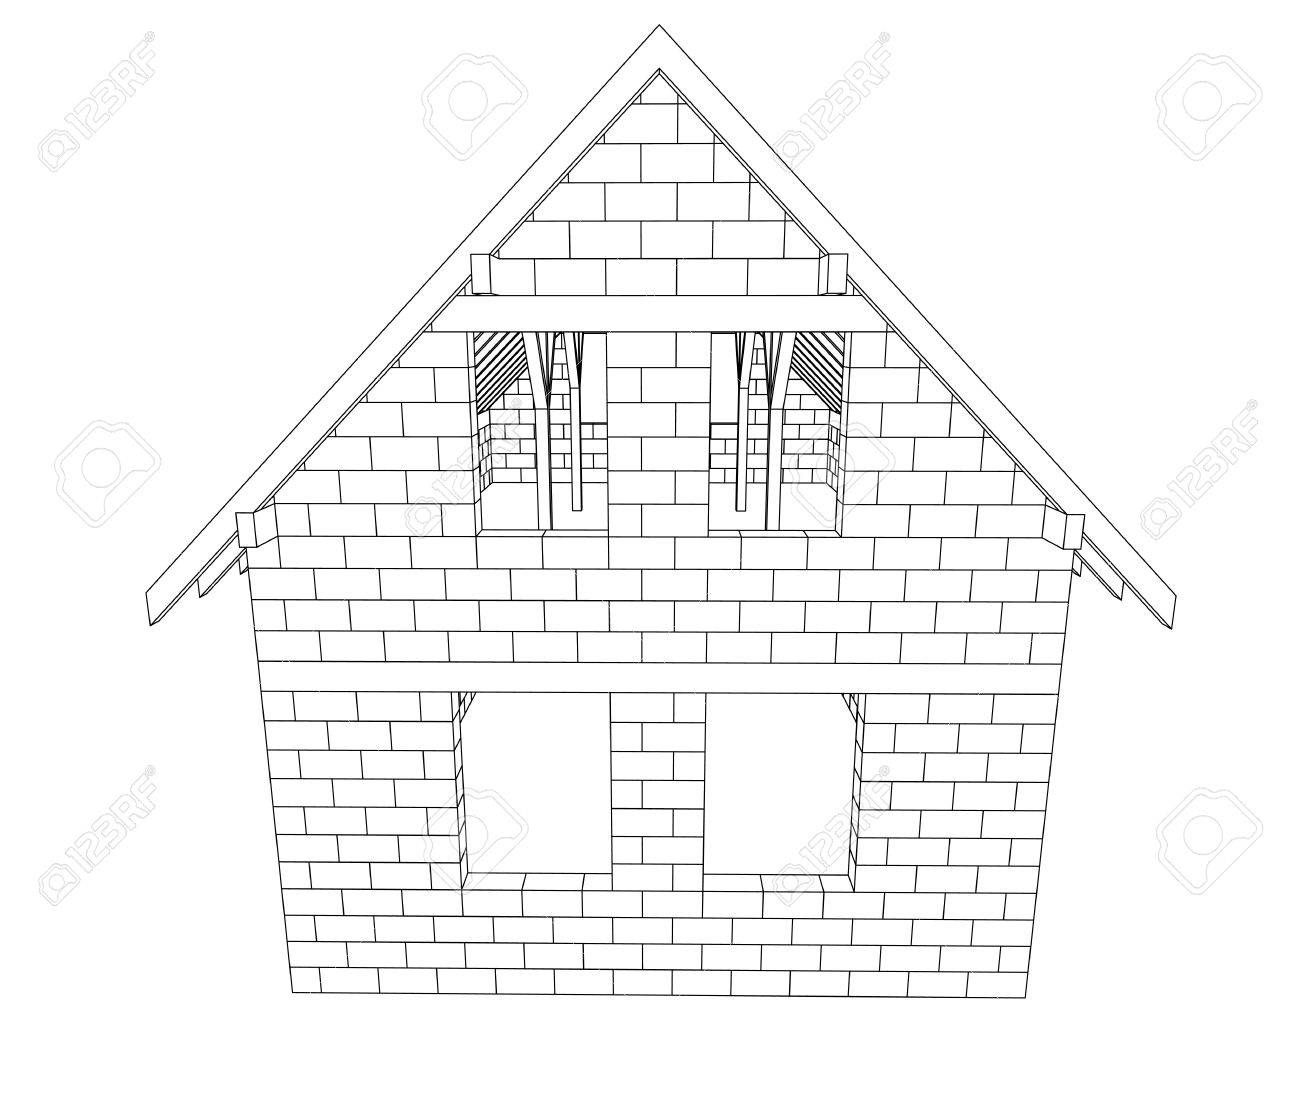 bricked house construction line drawing vector illustration Stock Illustration - 21228863